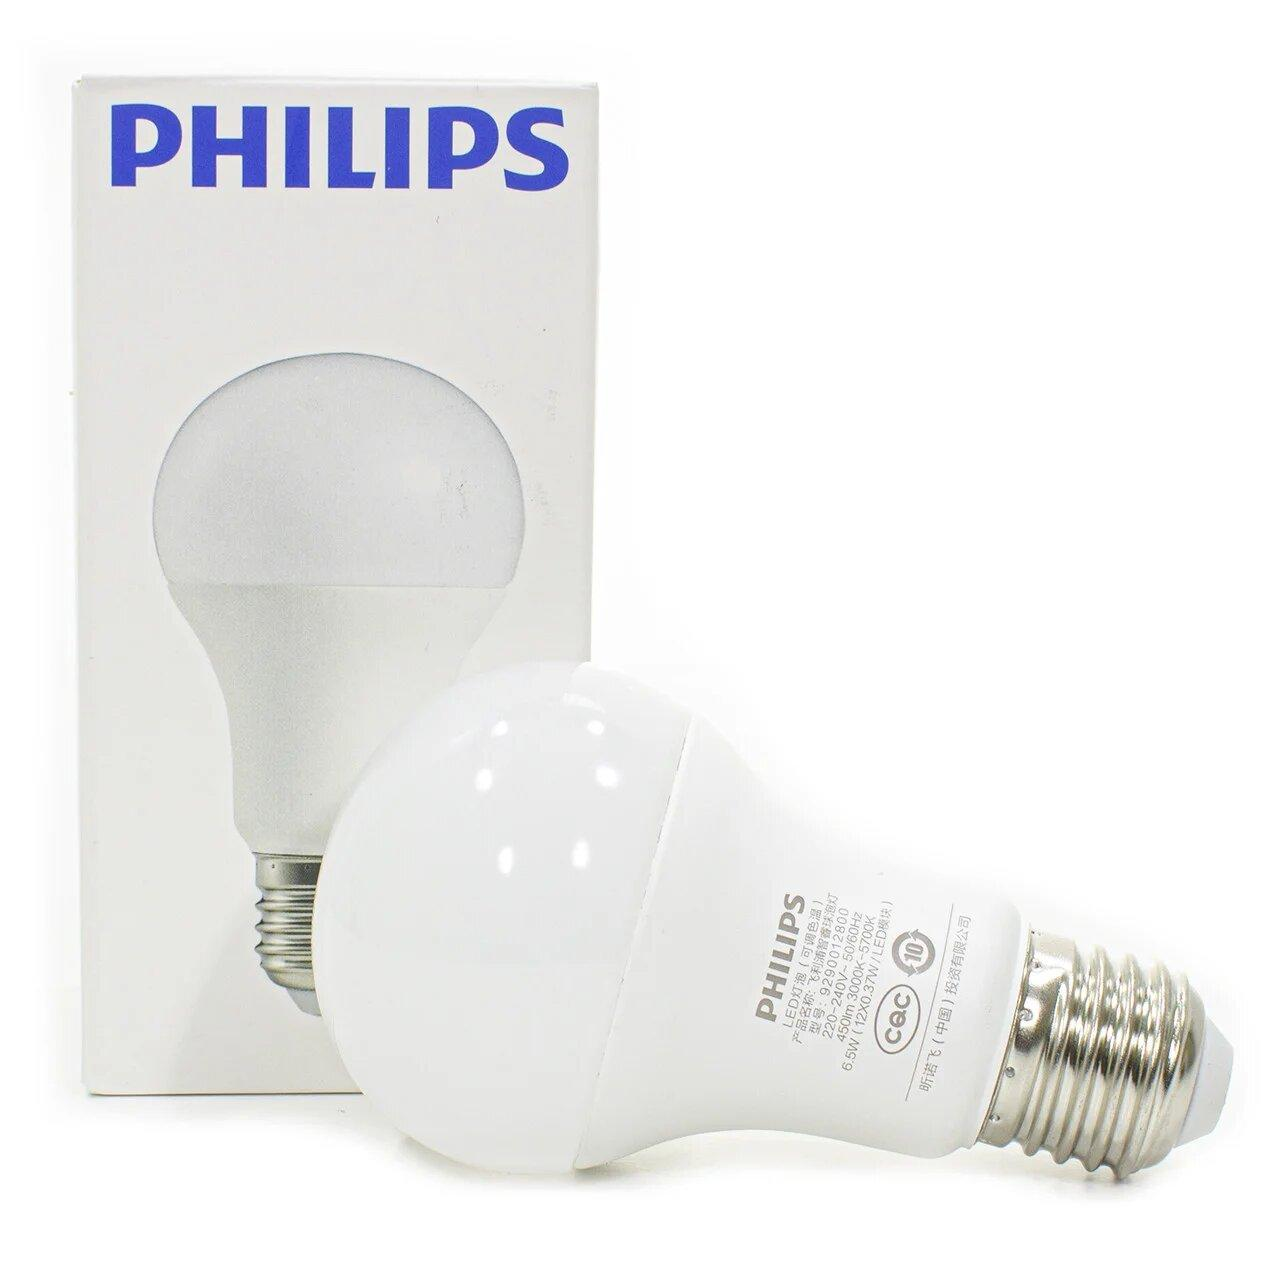 Philips Zhirui LED Wi-Fi Smart Bulb E27 Умная лампа